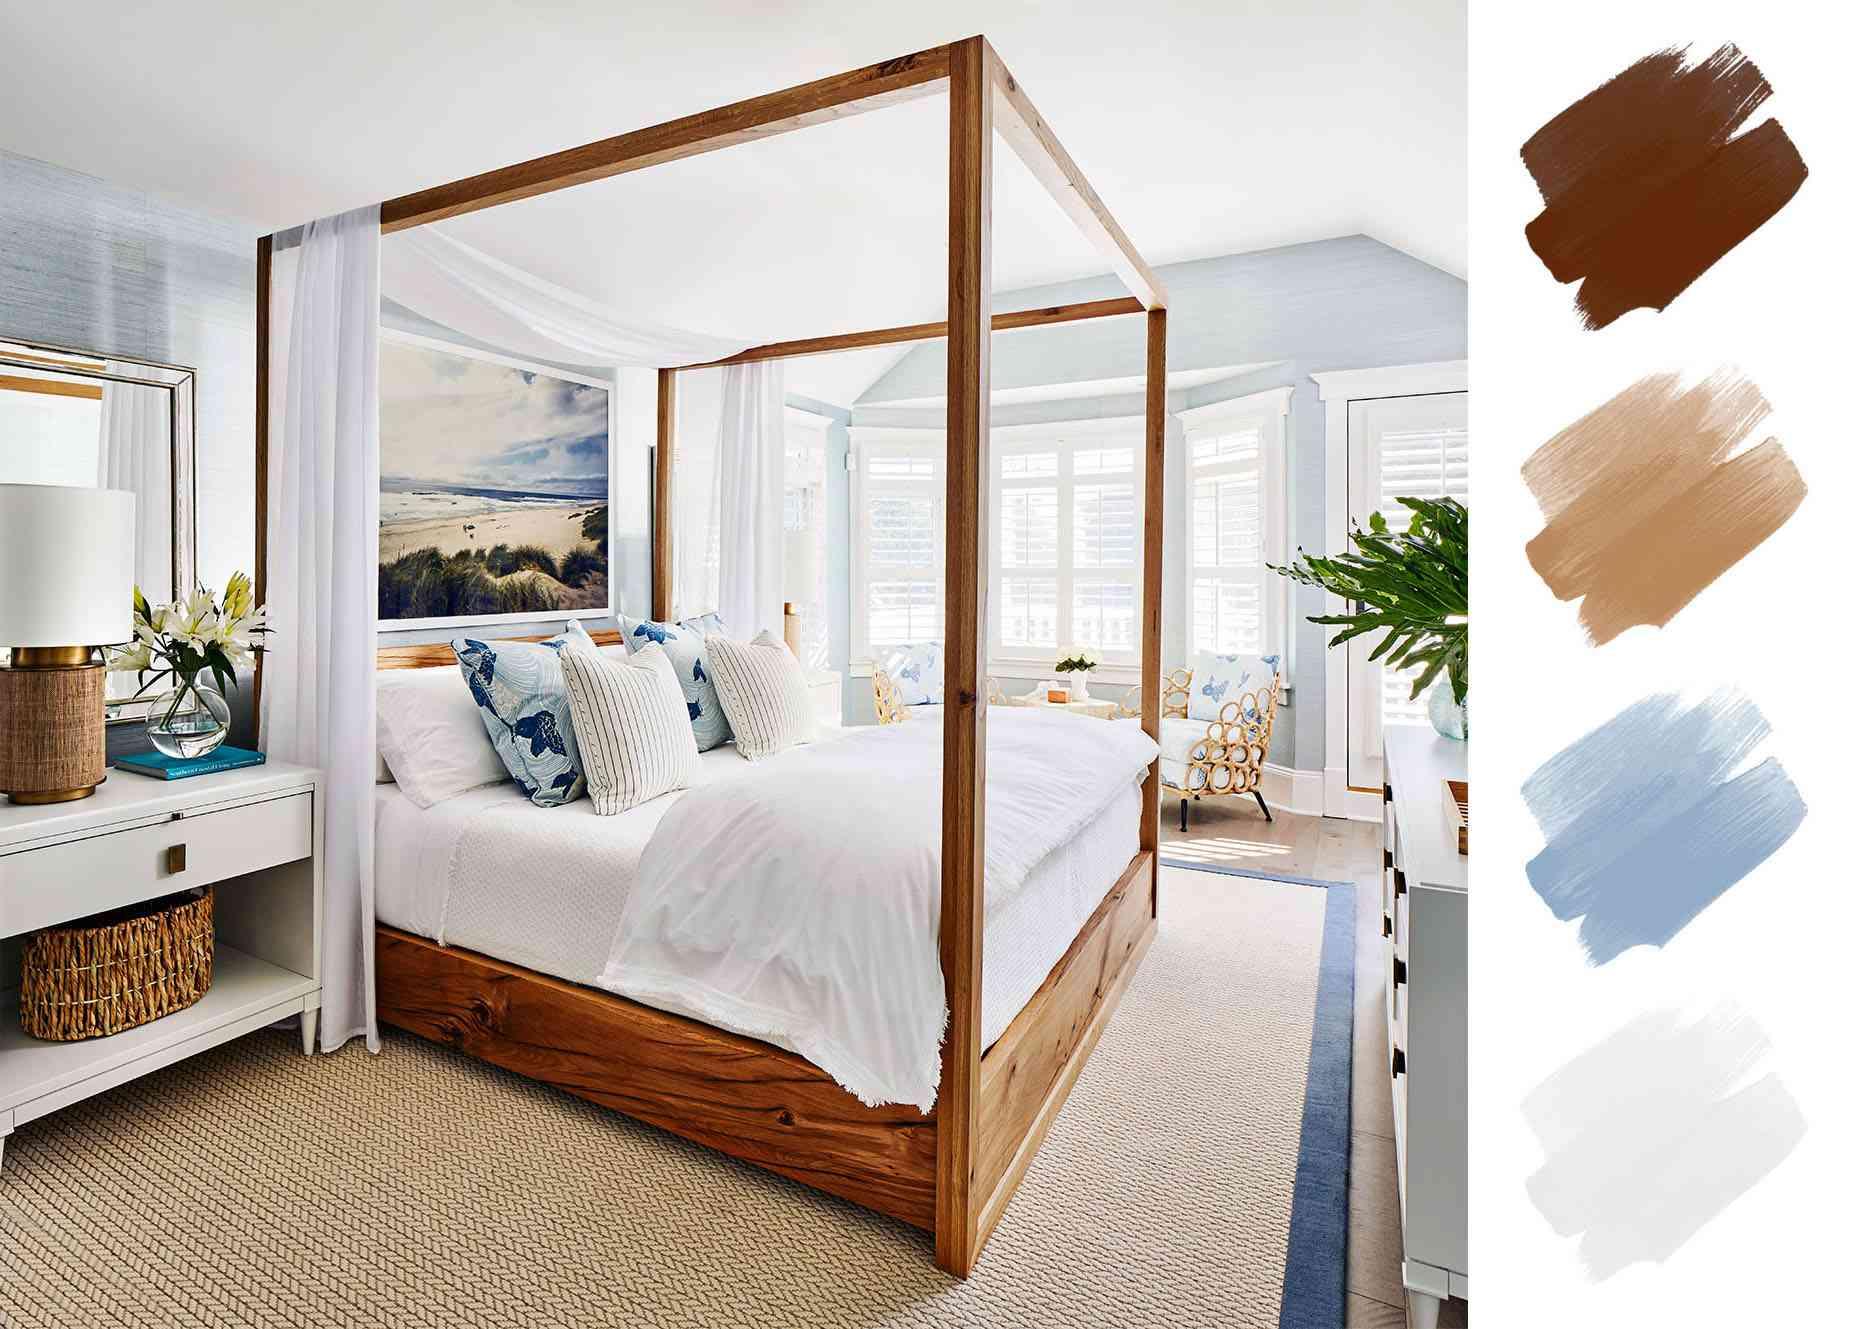 bedroom color schemes - blue white wood